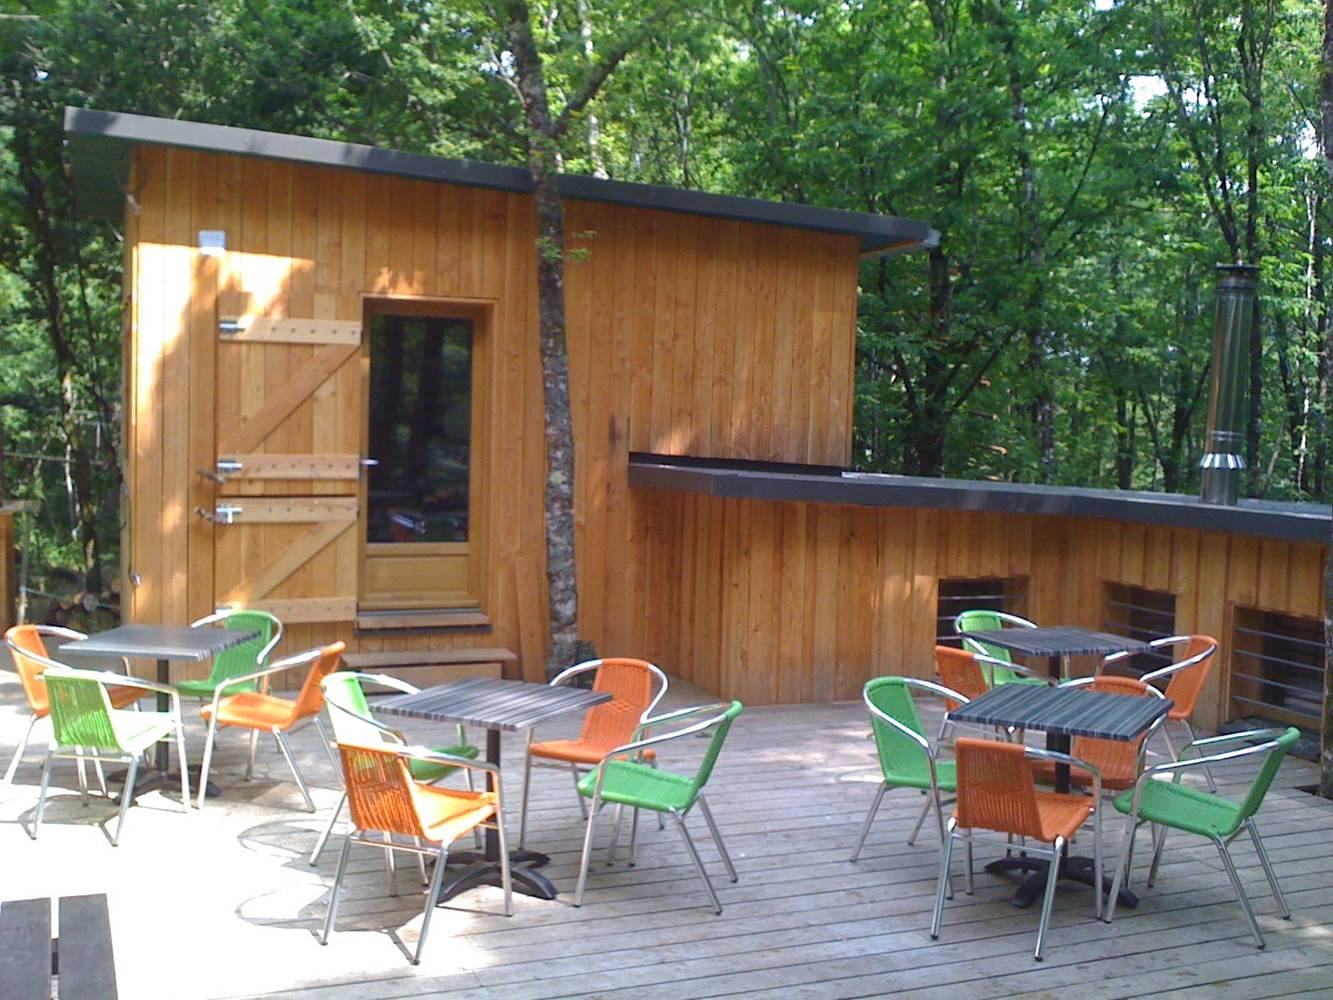 Parc Aventure FORET ADRENALINE - Carnac - Terrasses ©